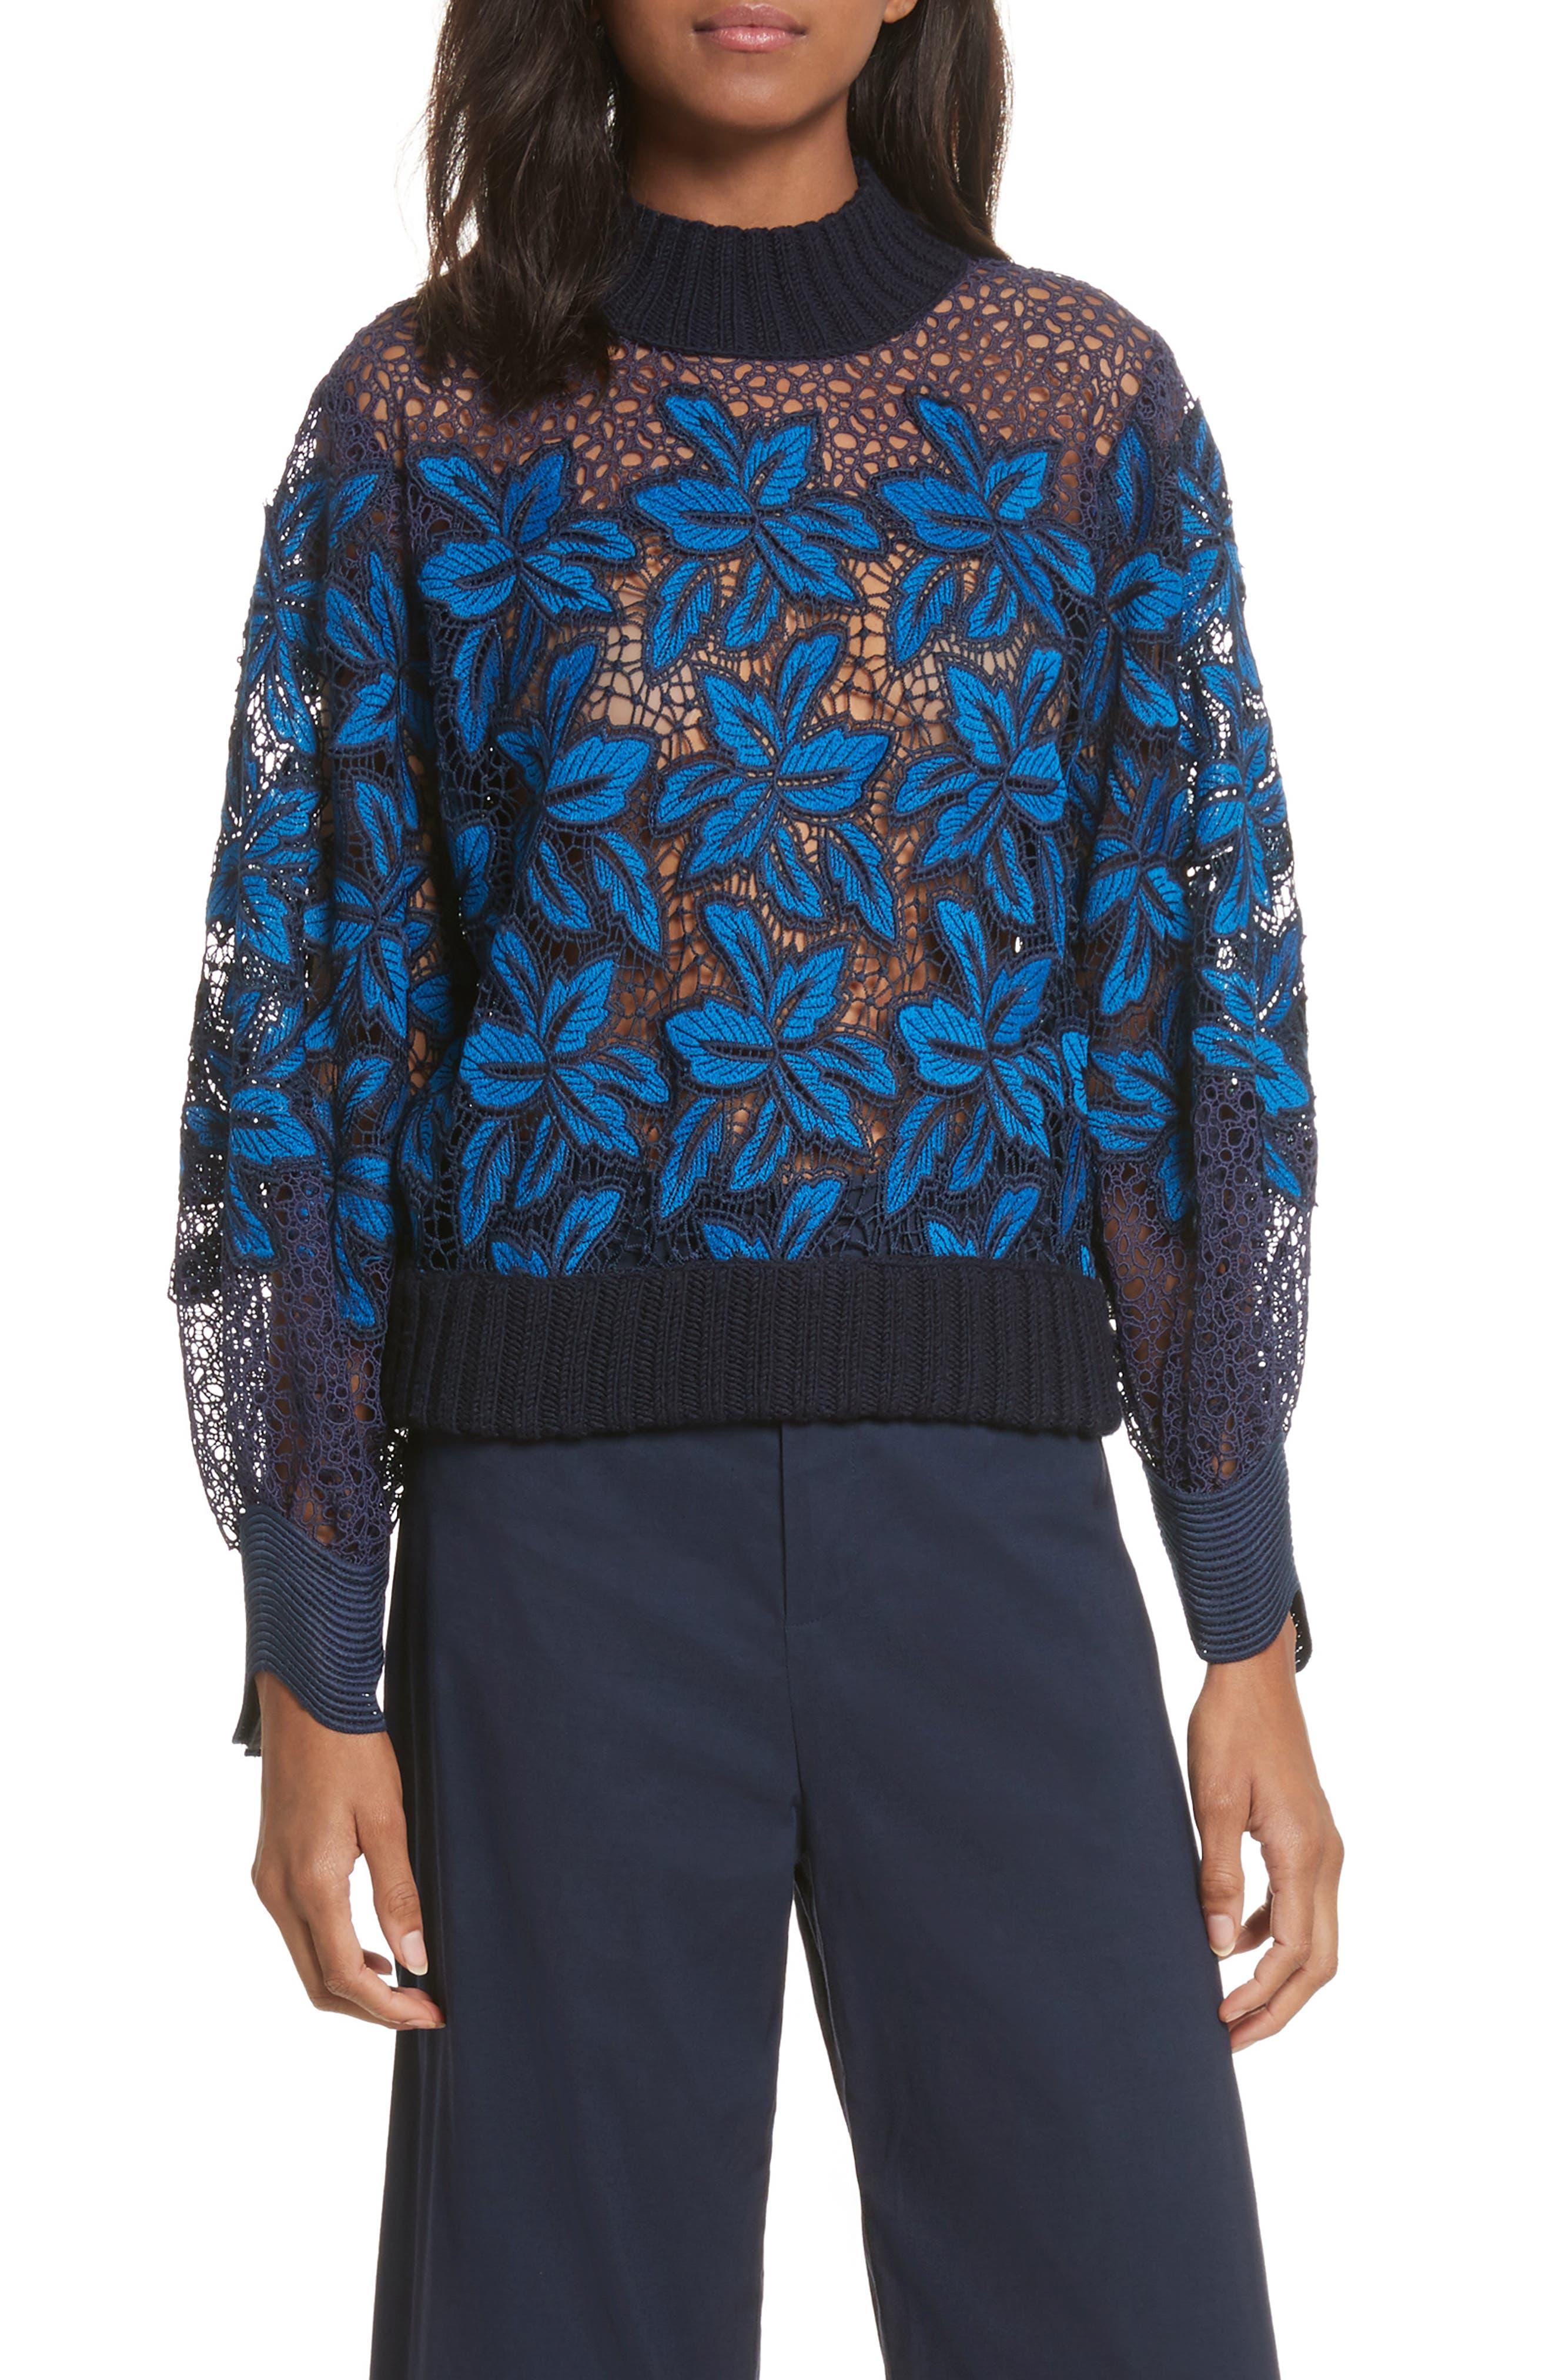 Alternate Image 1 Selected - Sea Mosaic Lace Bell Sleeve Sweatshirt